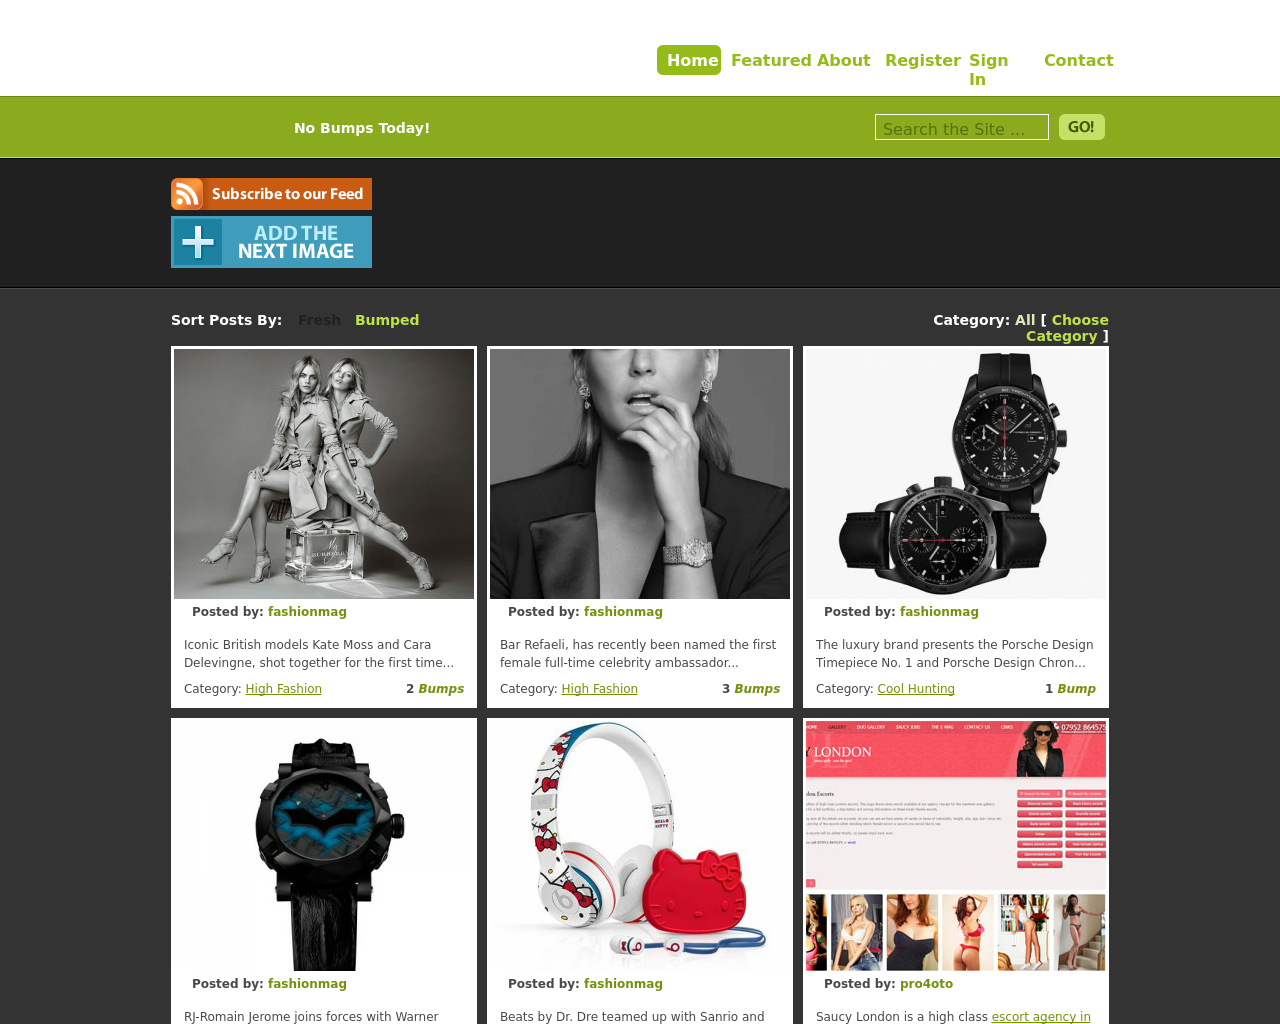 FreshBump-Advertising-Reviews-Pricing